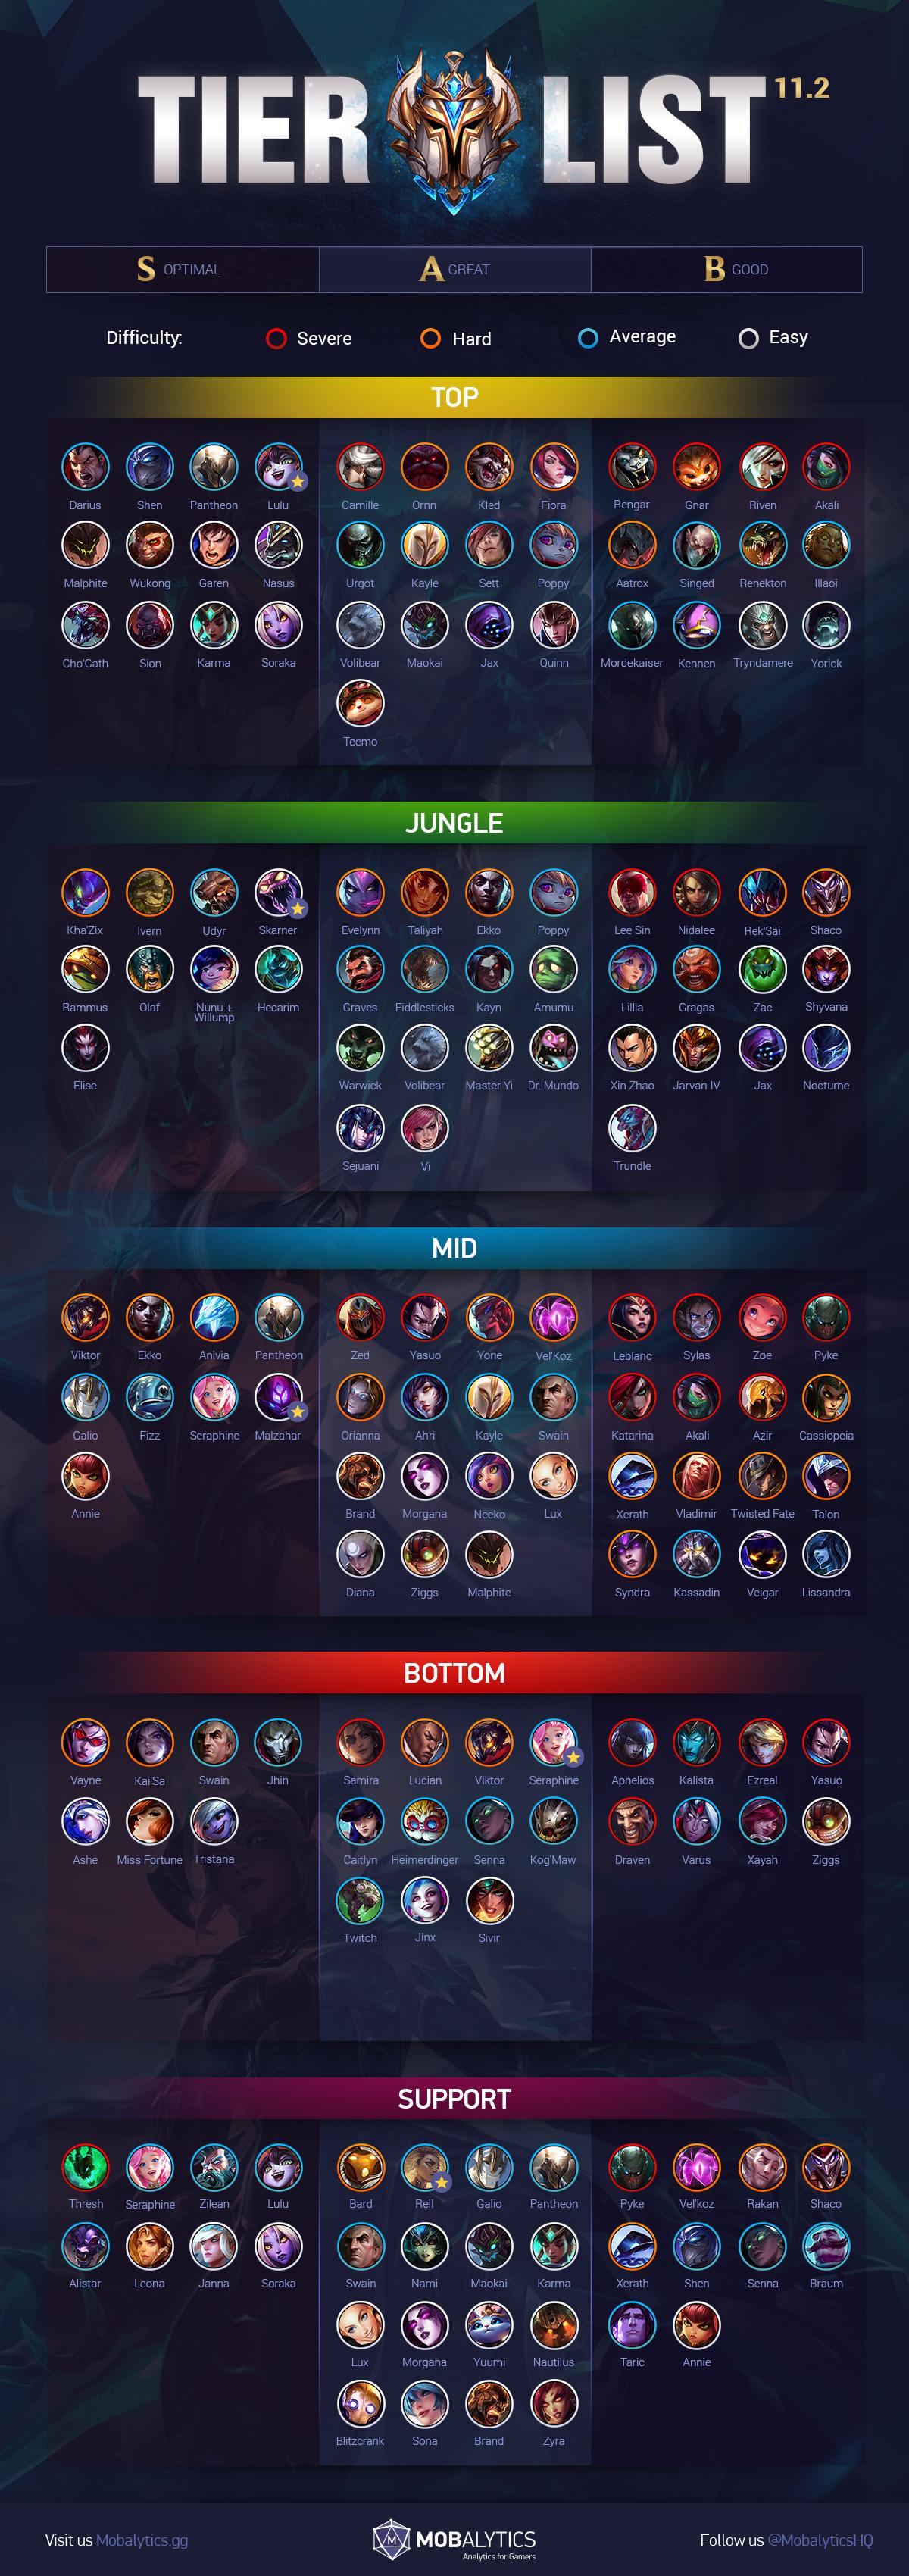 LoL High Elo Tier List Patch 11.2